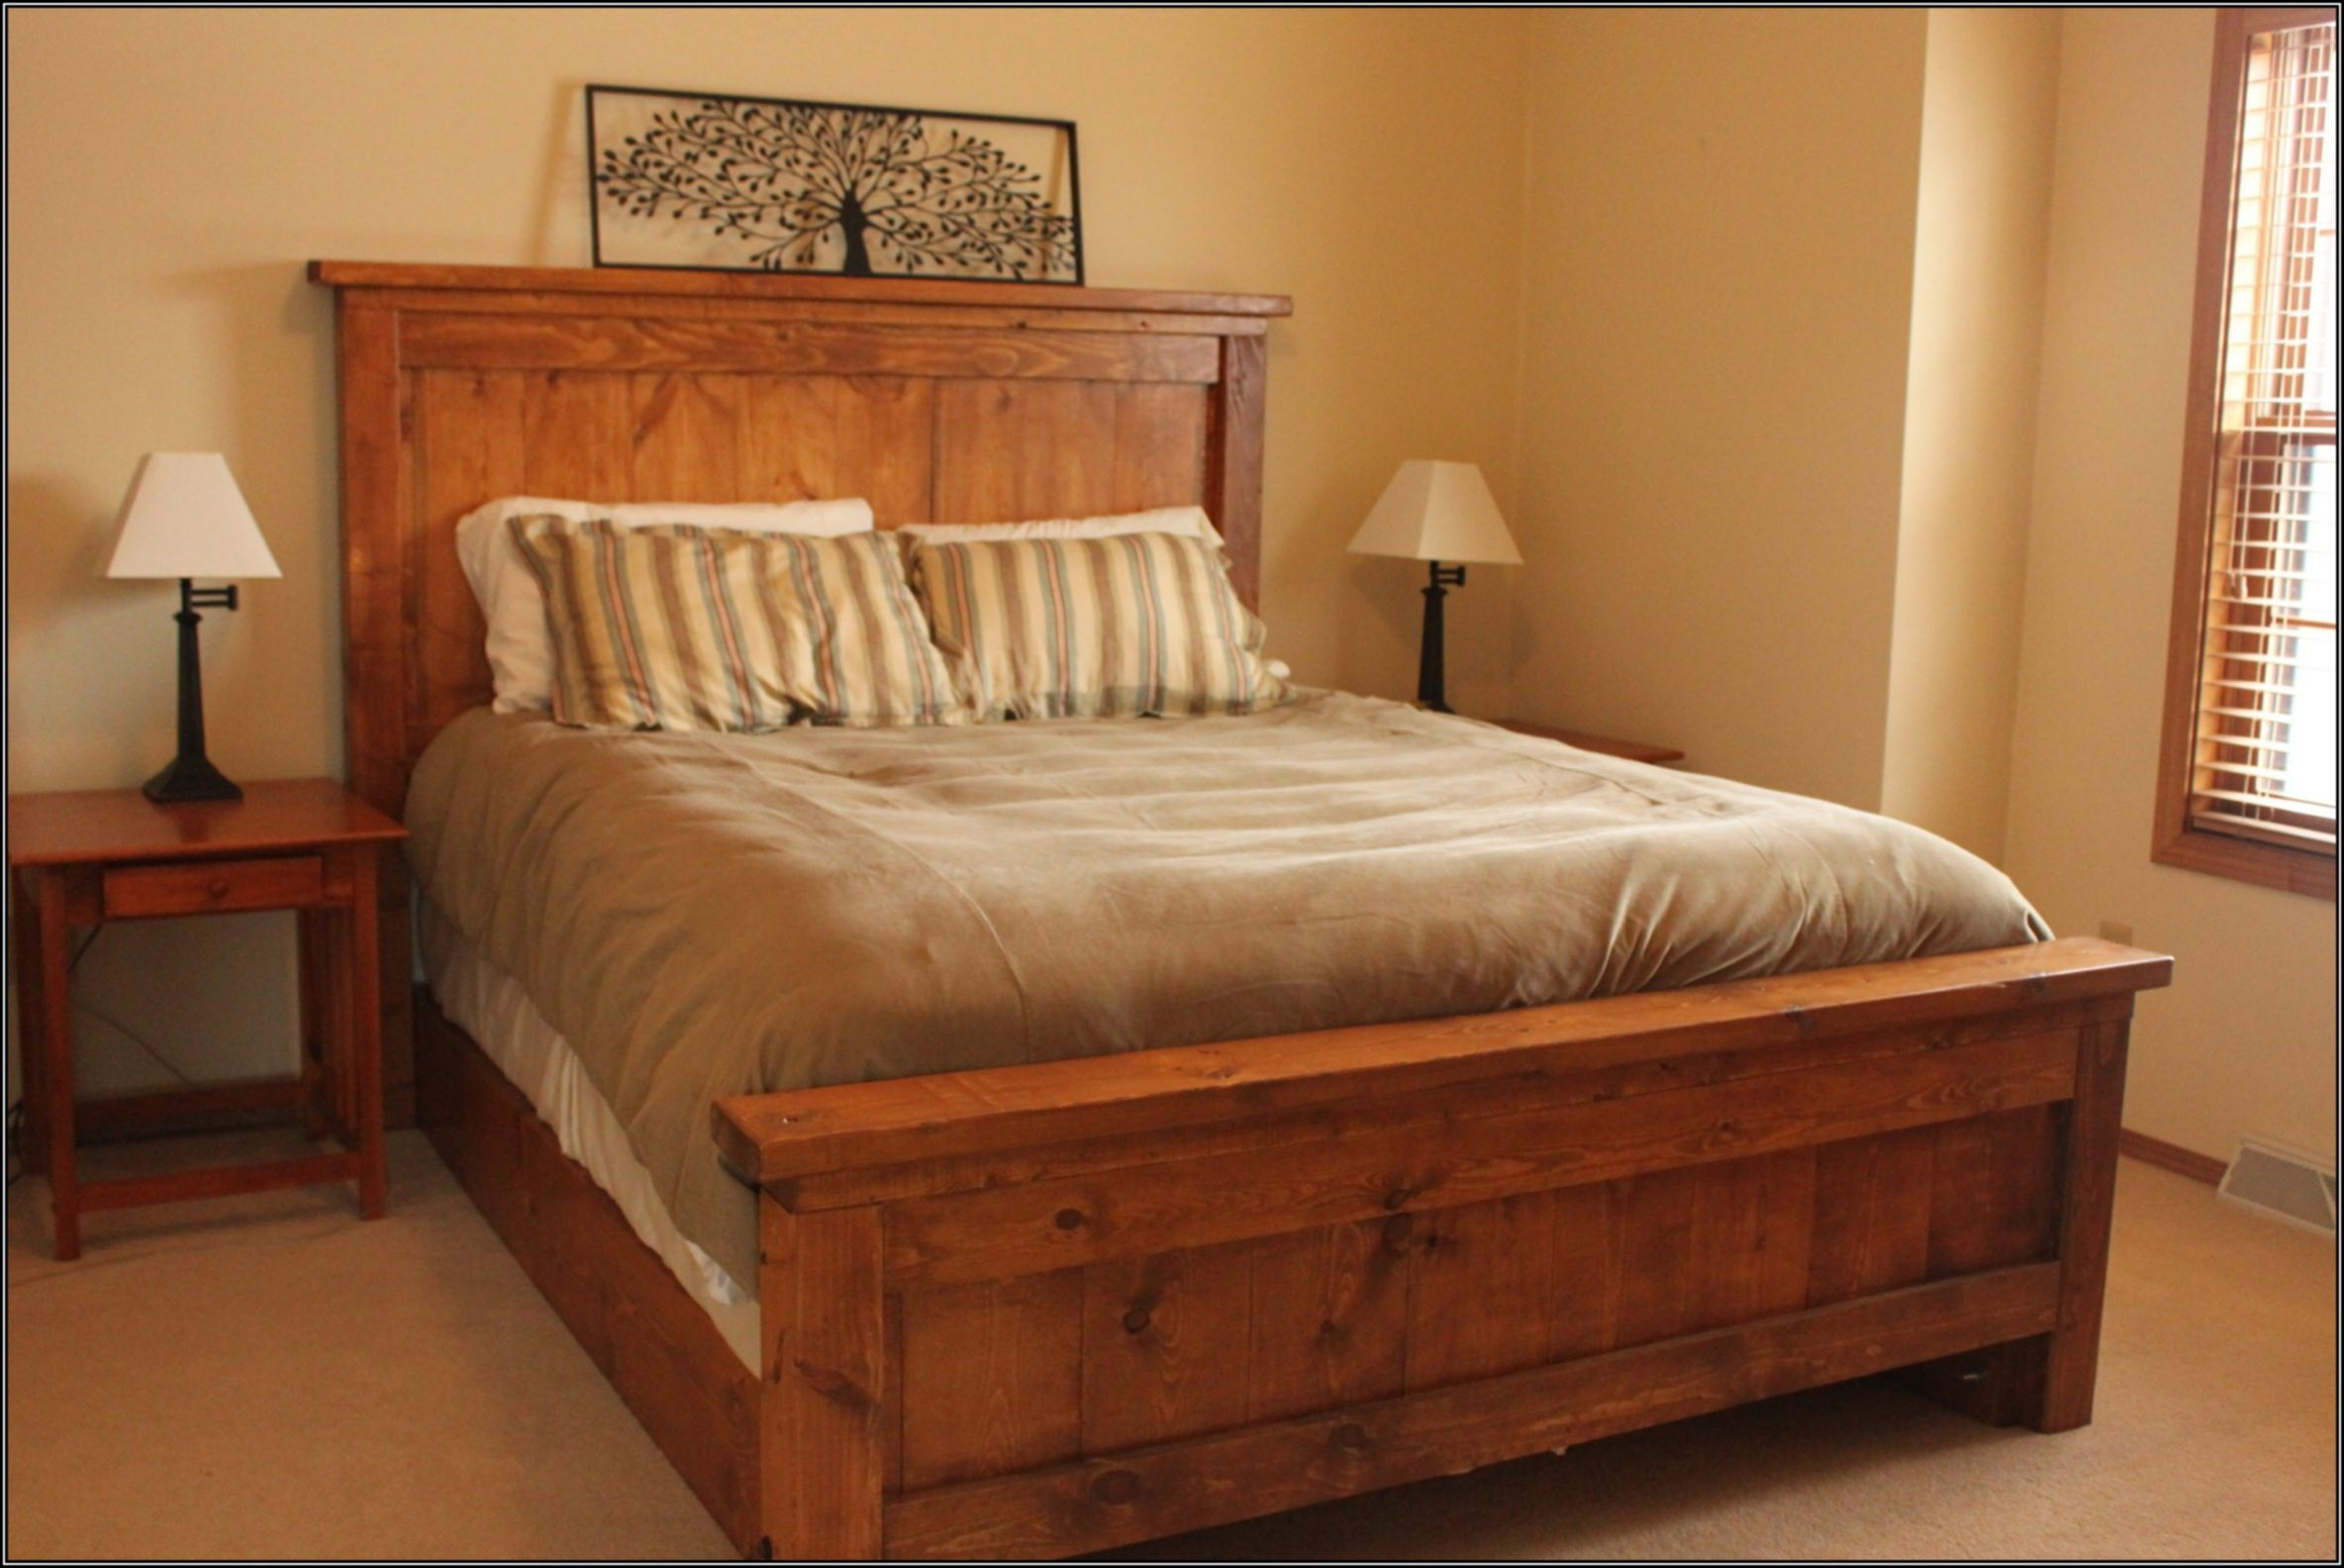 Amazing 10 Diy Bedroom Furniture Ideas For Inspiration Diy Hacks